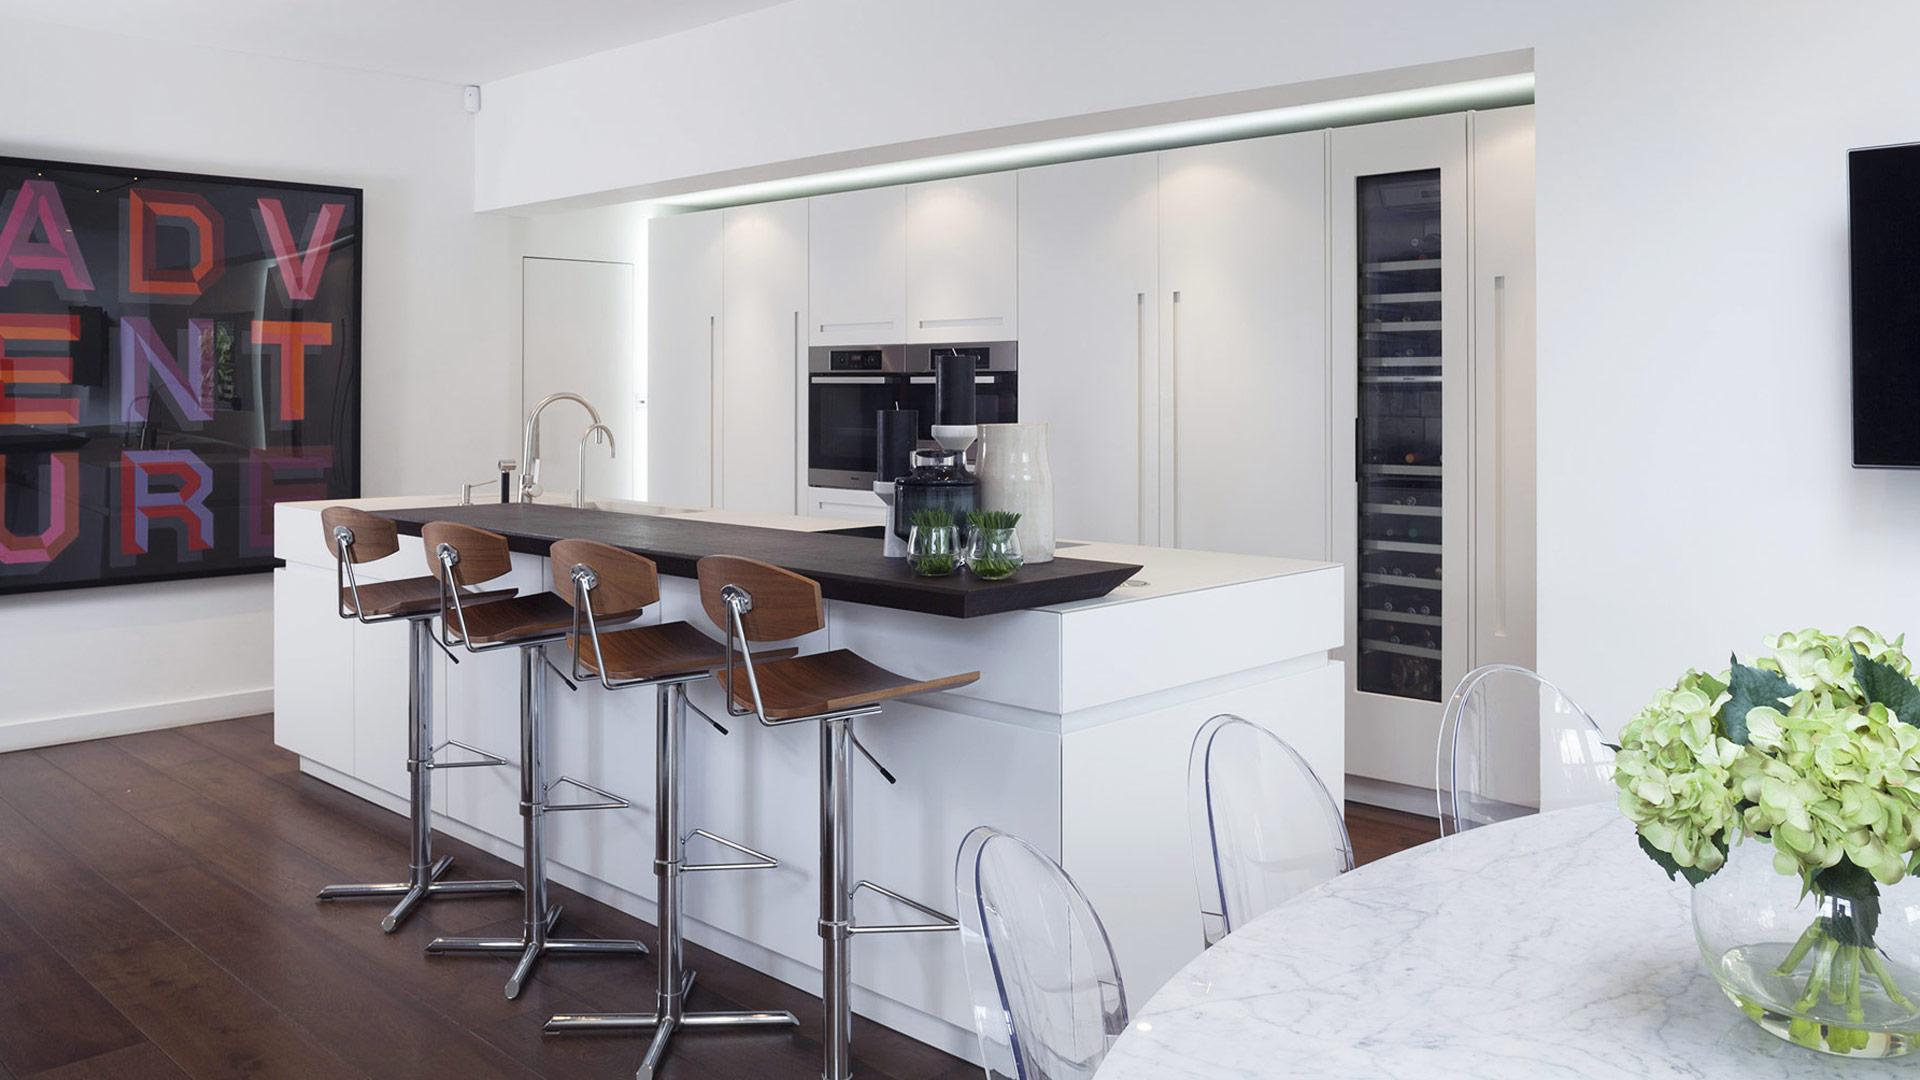 Cucine Moderne Con Isola Centrale. Cheap Veneta Cucine Start Time ...